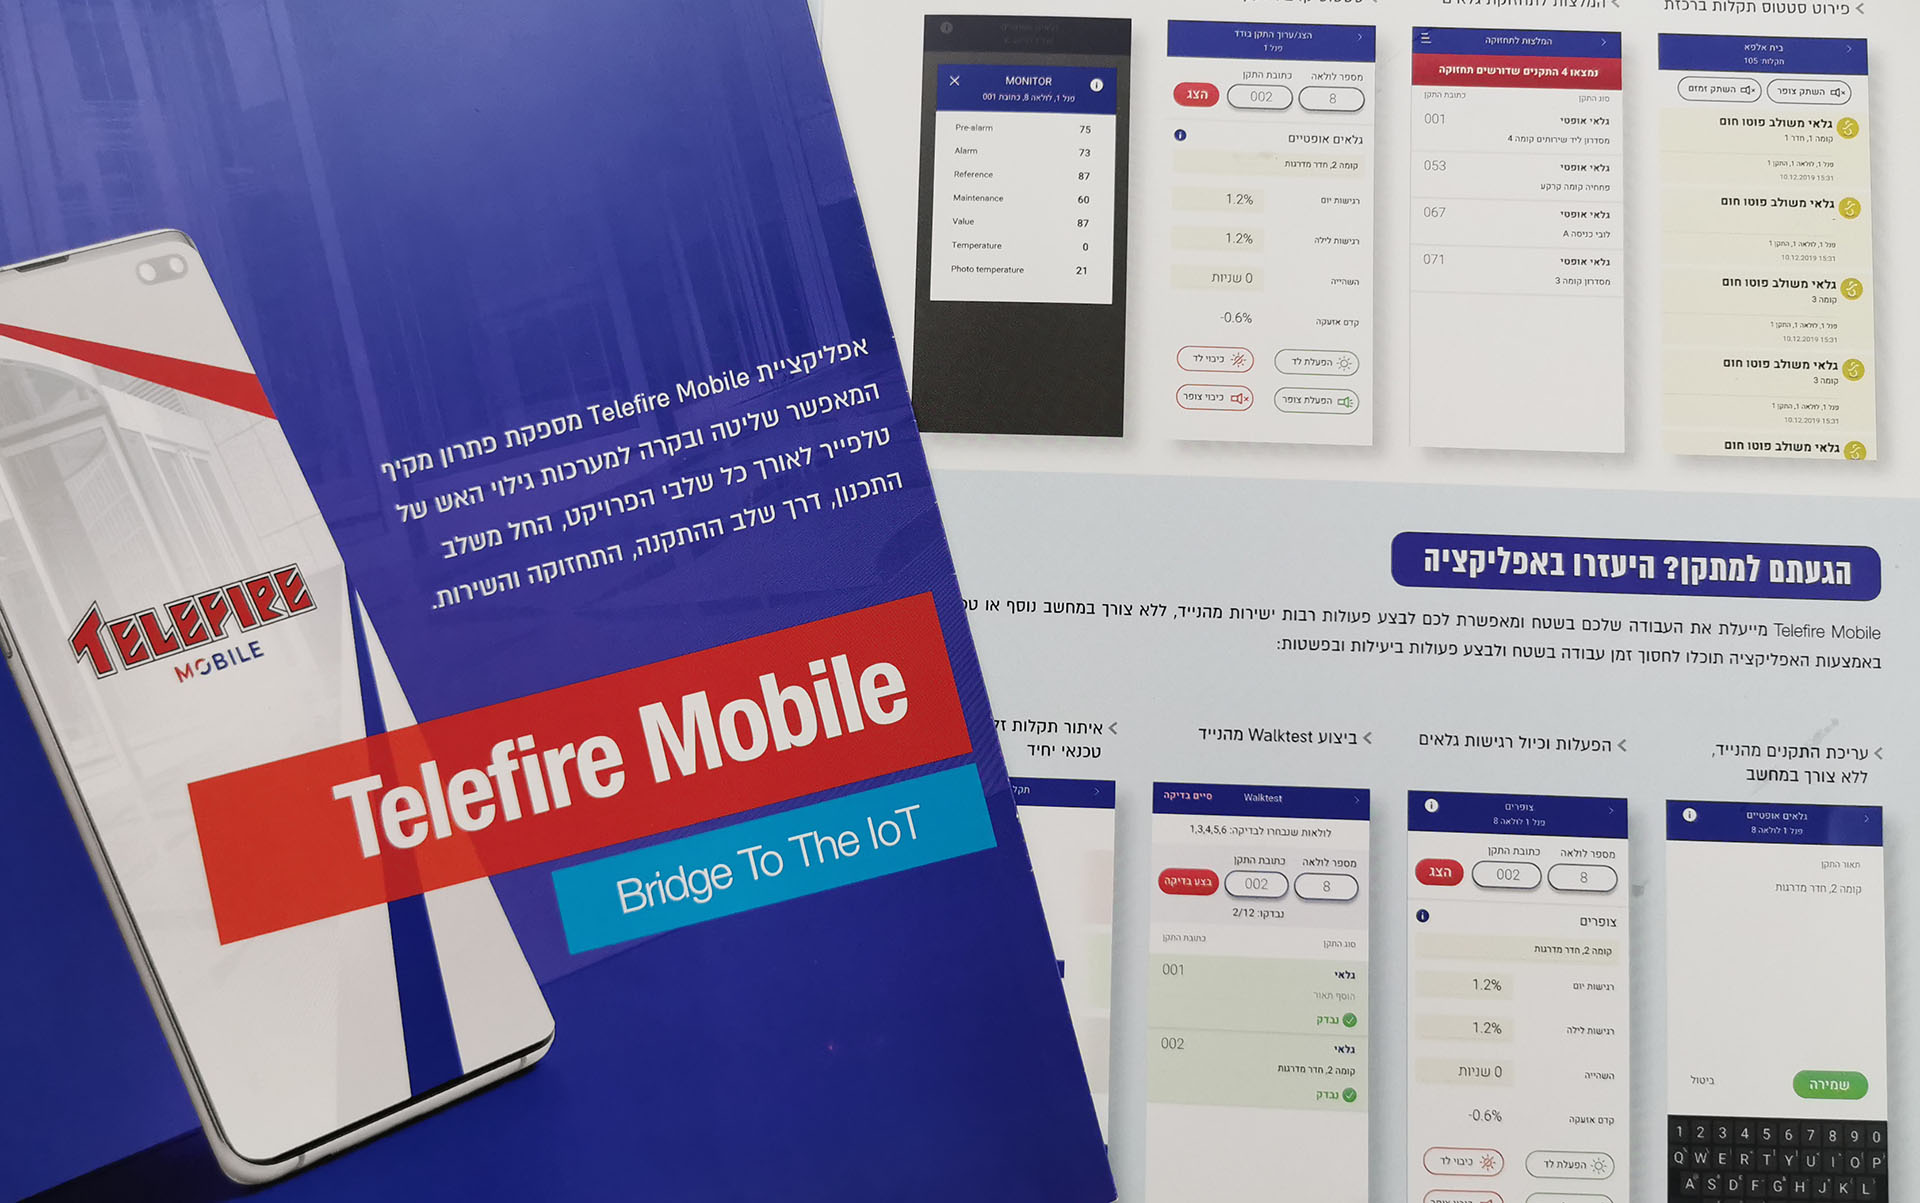 Telefire Mobile app brochure